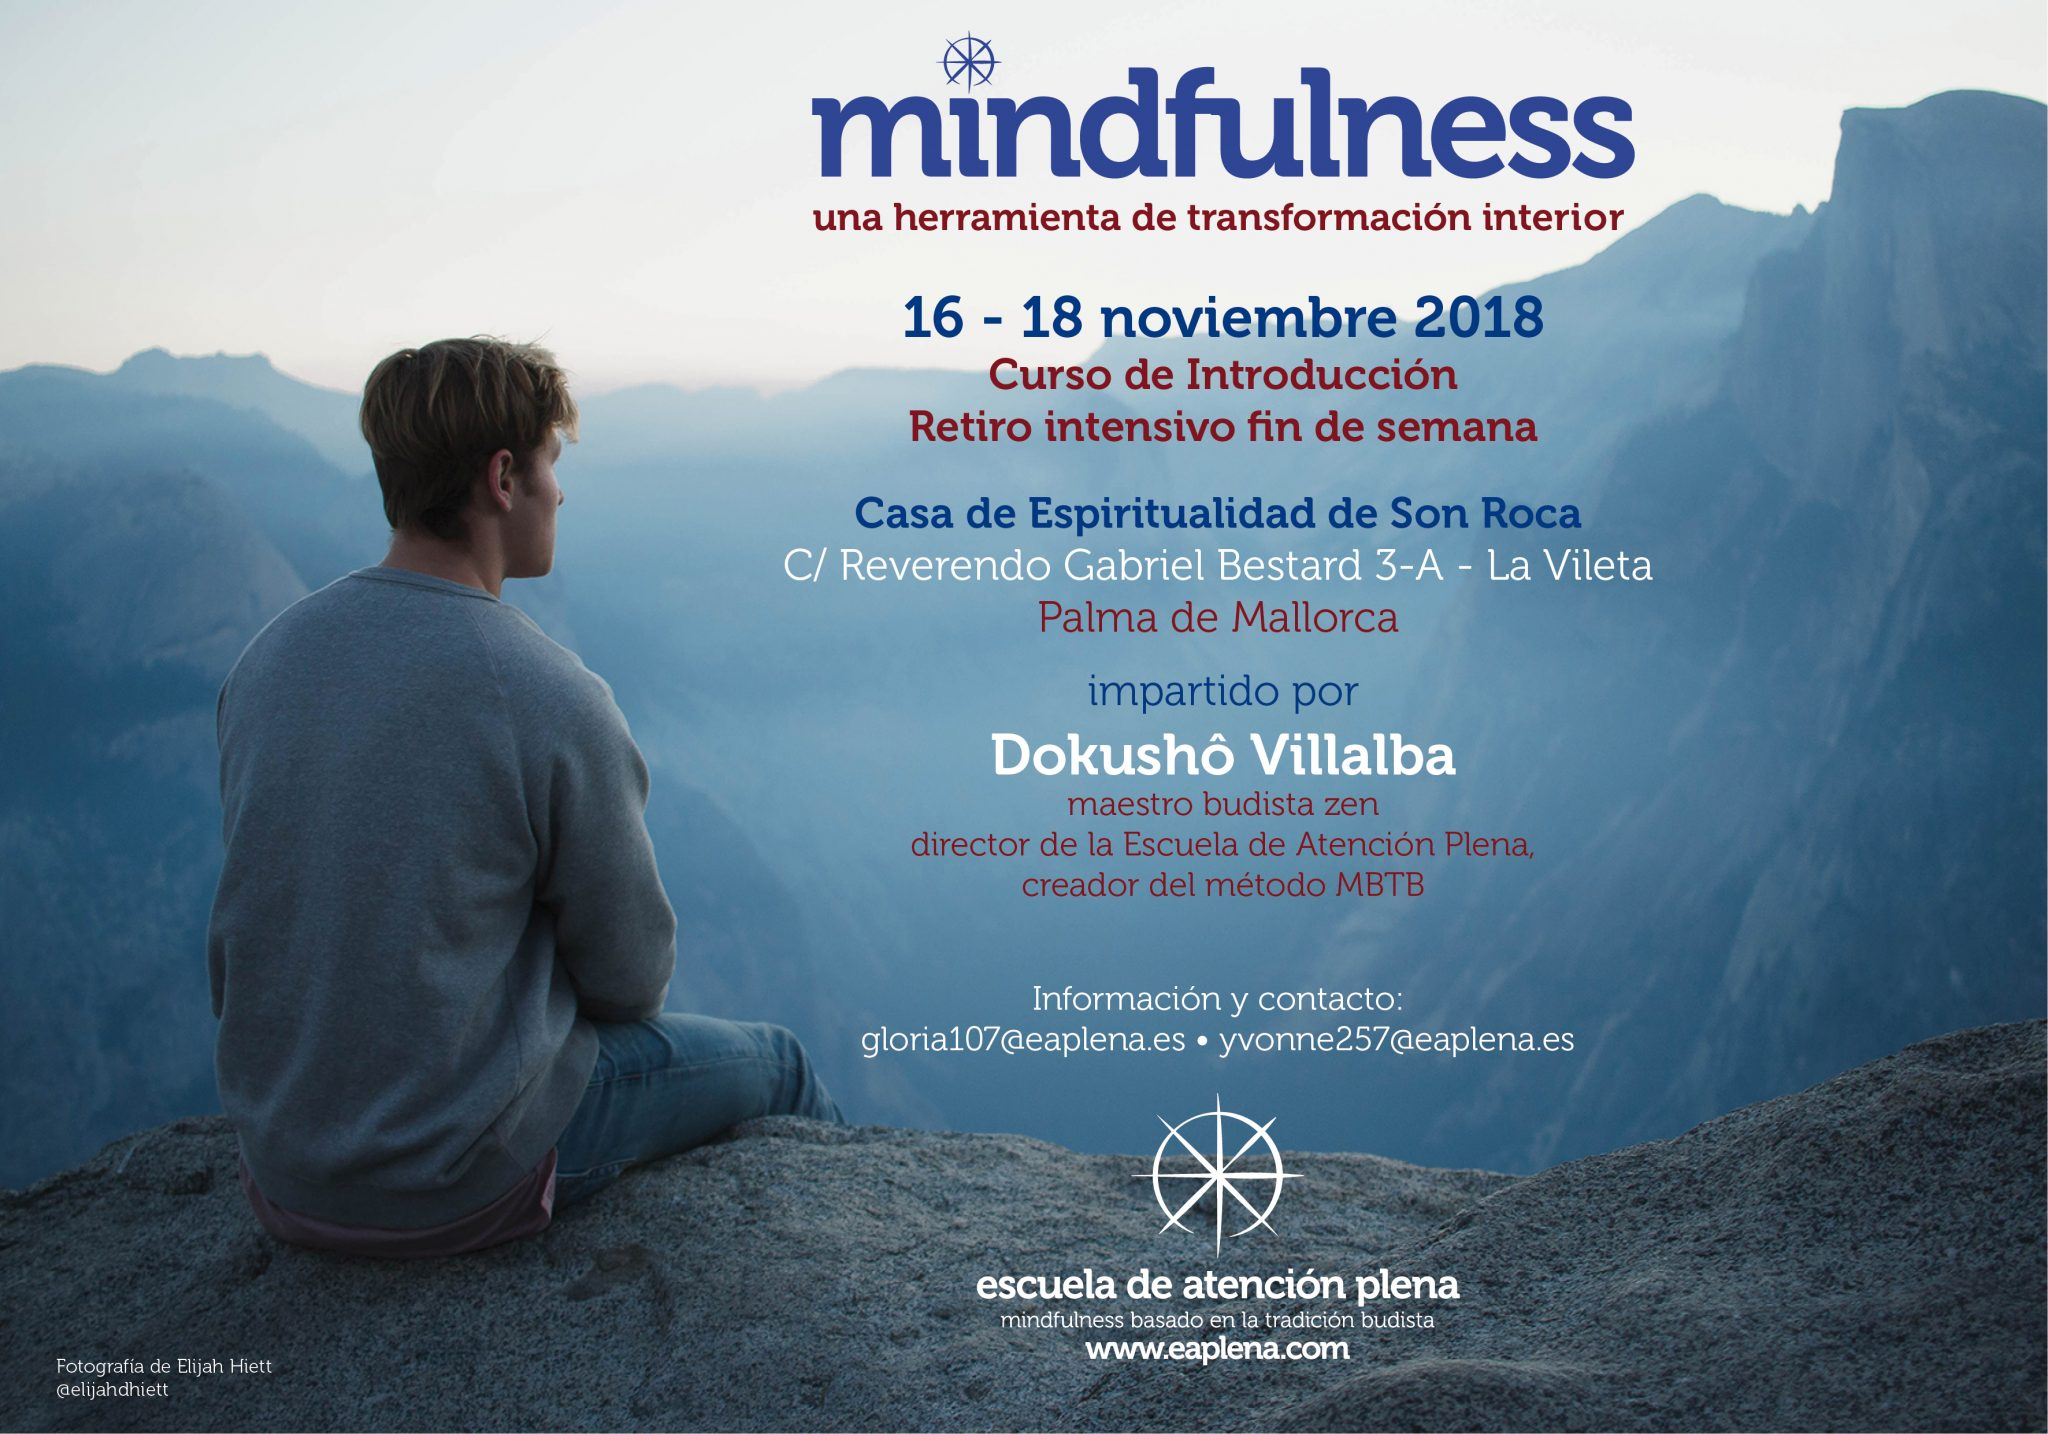 Mindfulness en Palma de Mallorca